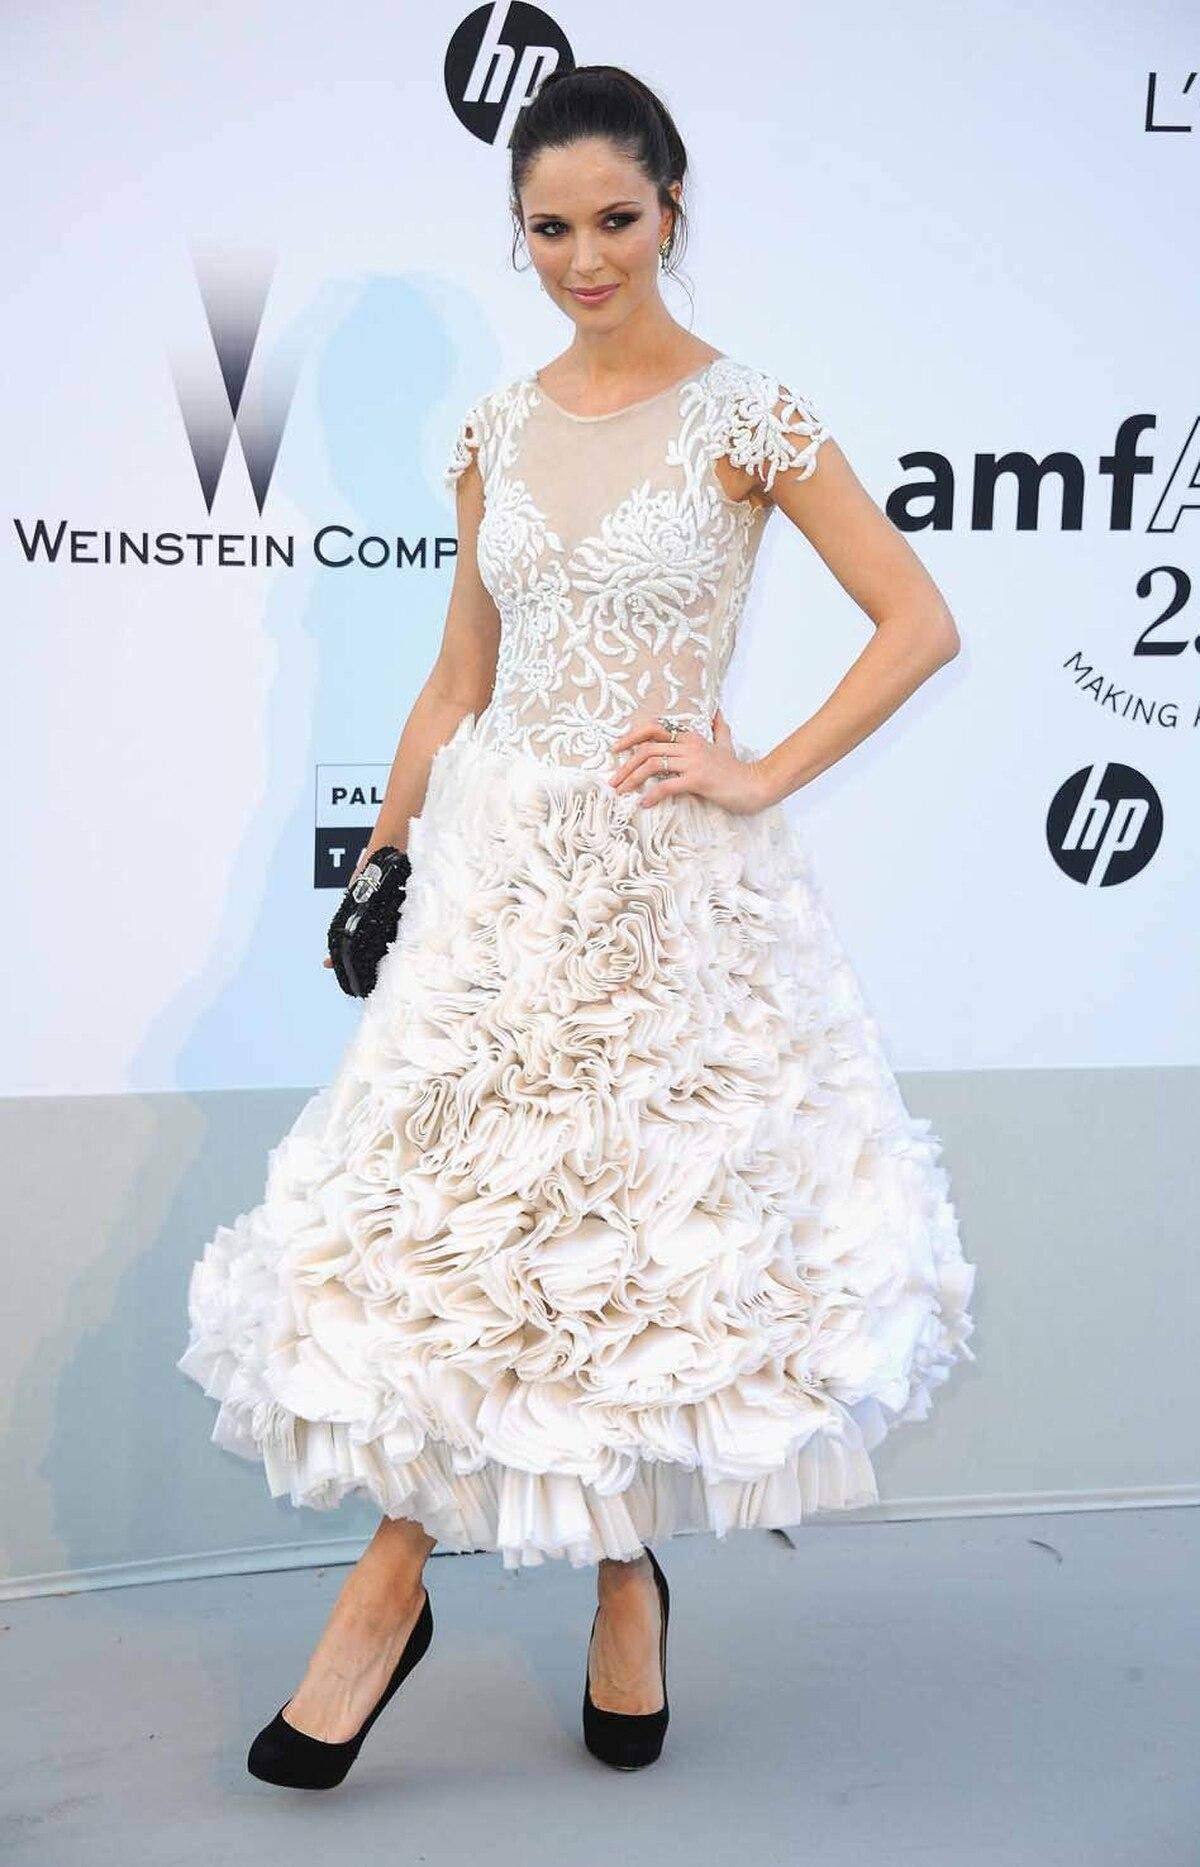 Georgina Chapman attends amfAR's Cinema Against AIDS Gala at the Cannes Film Festival on Thursday.